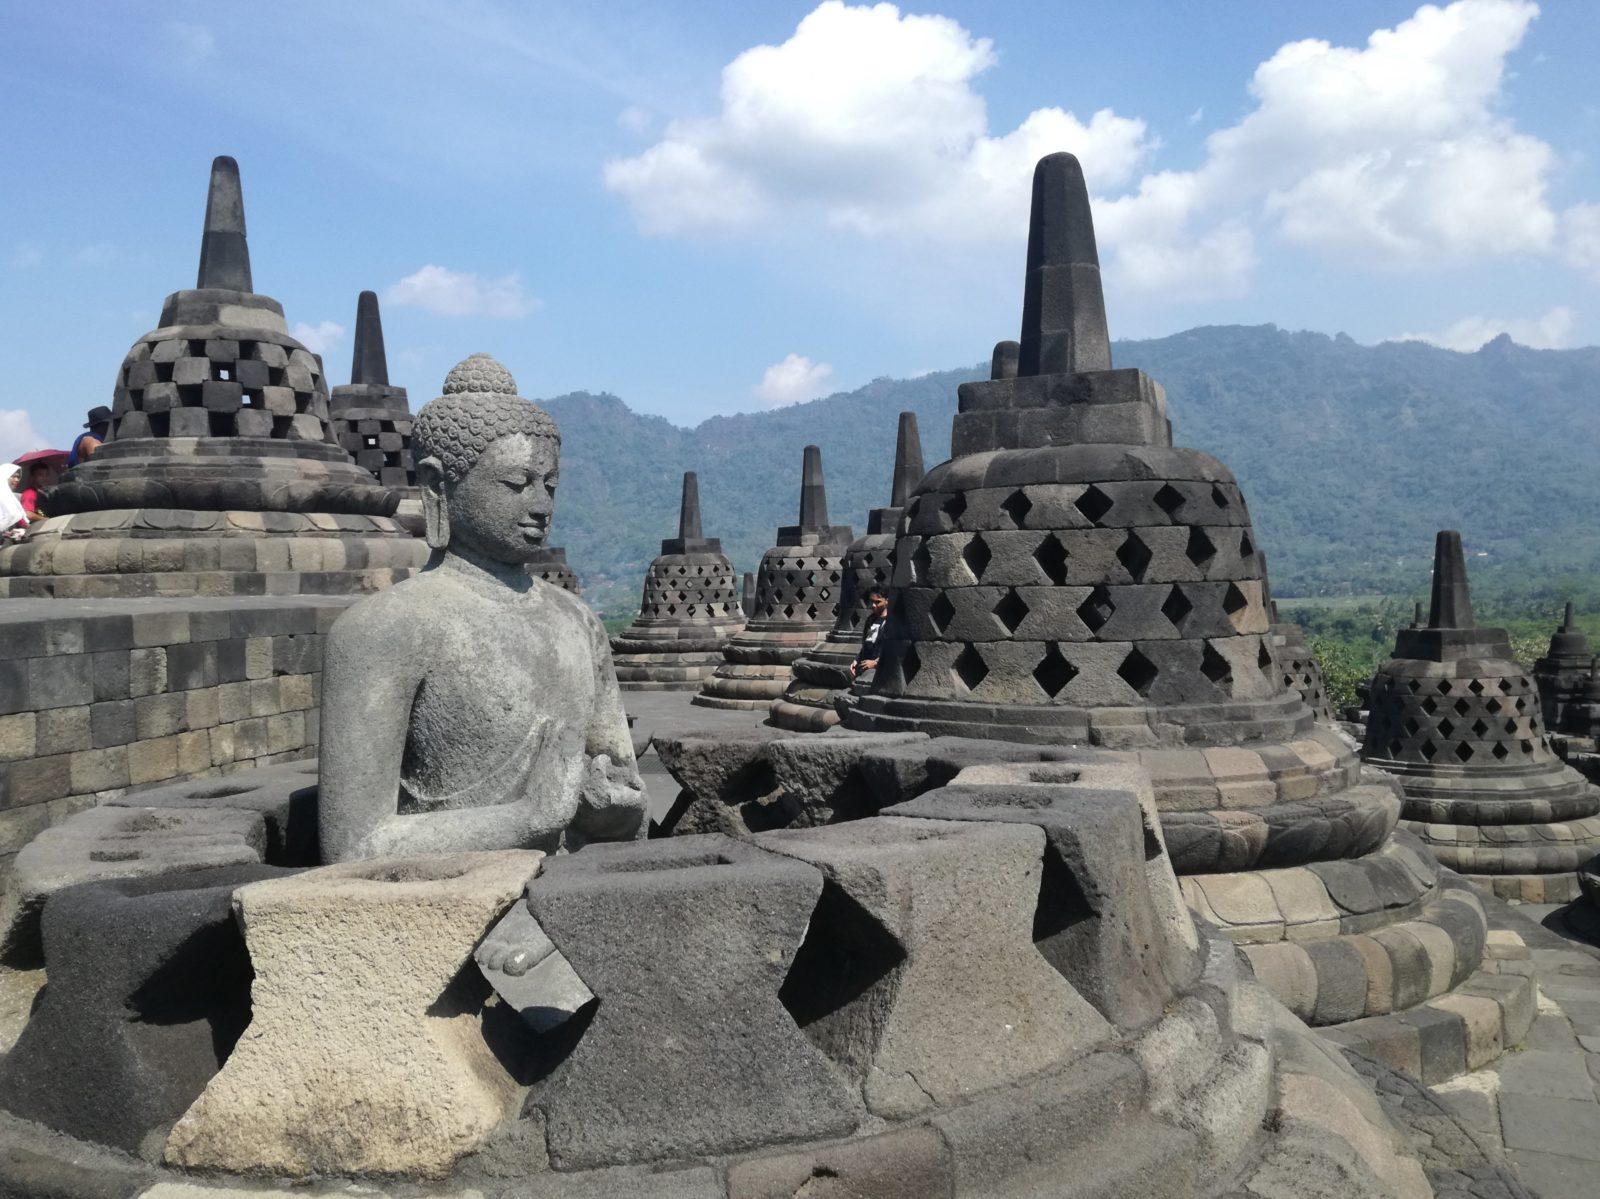 Candi Borobudur Tiket Aktivitas Januari 2020 Travelspromo